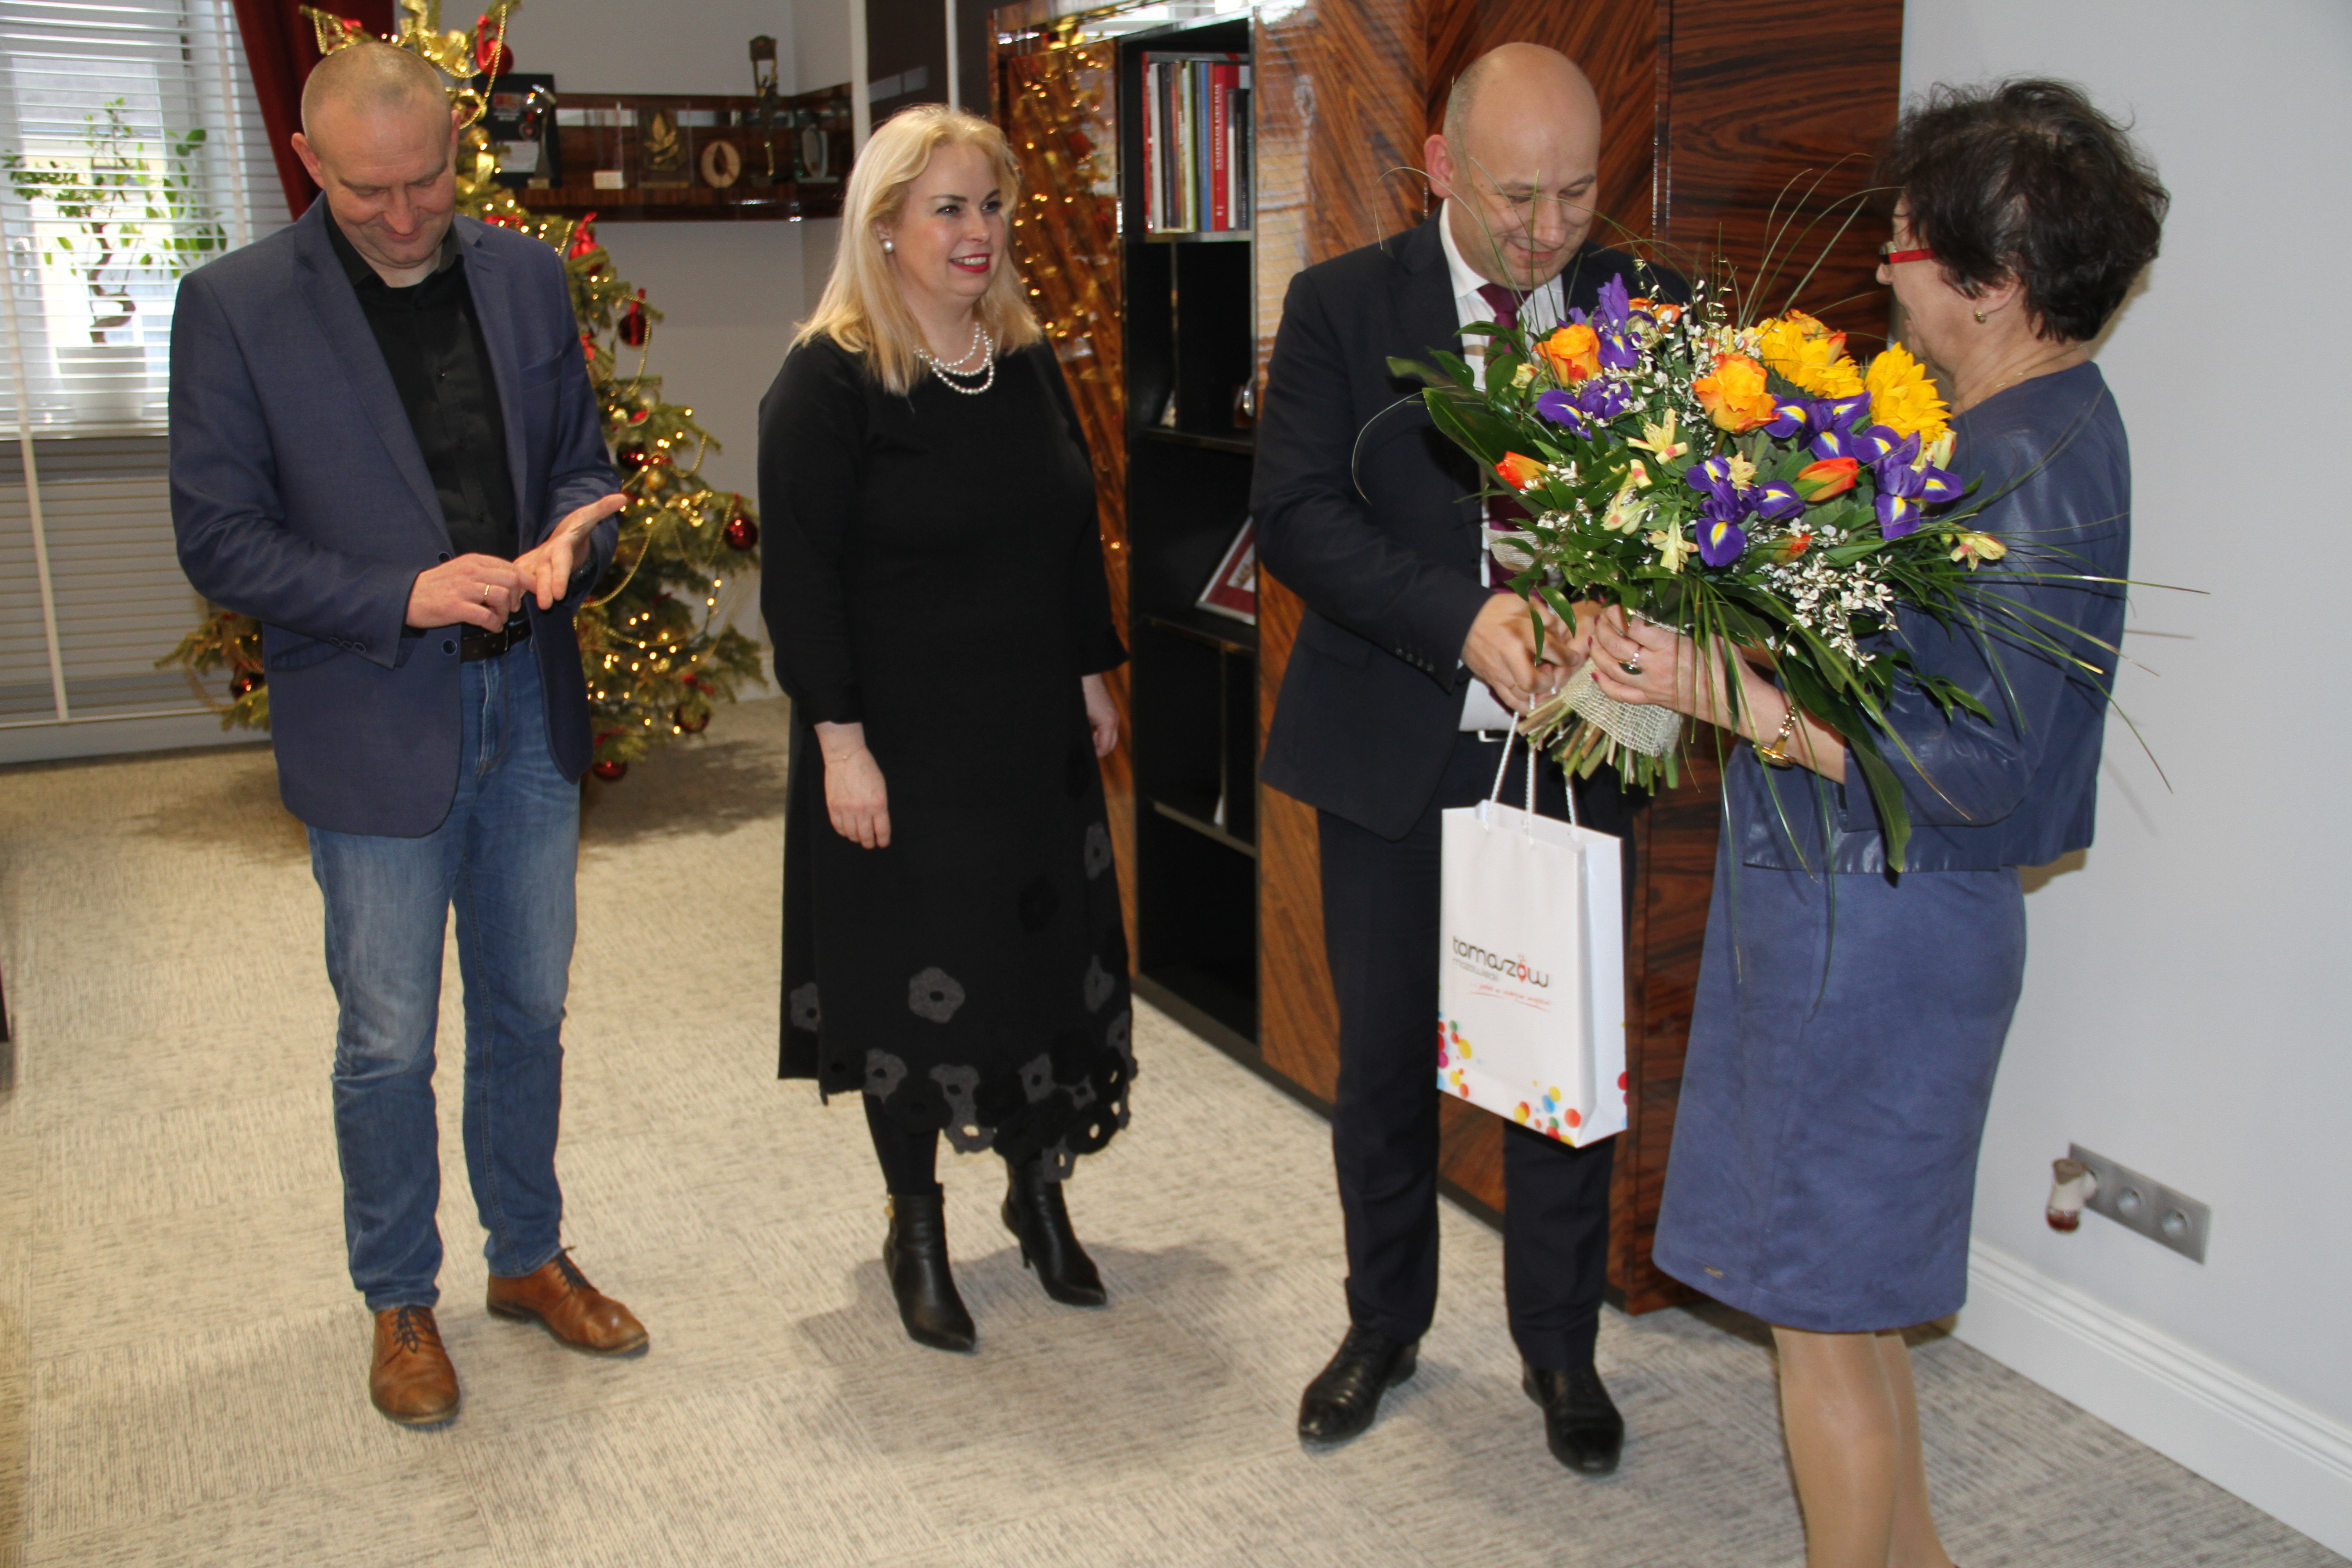 Pożegnanie Pani skarbnik Mariolii Sobolewskiej